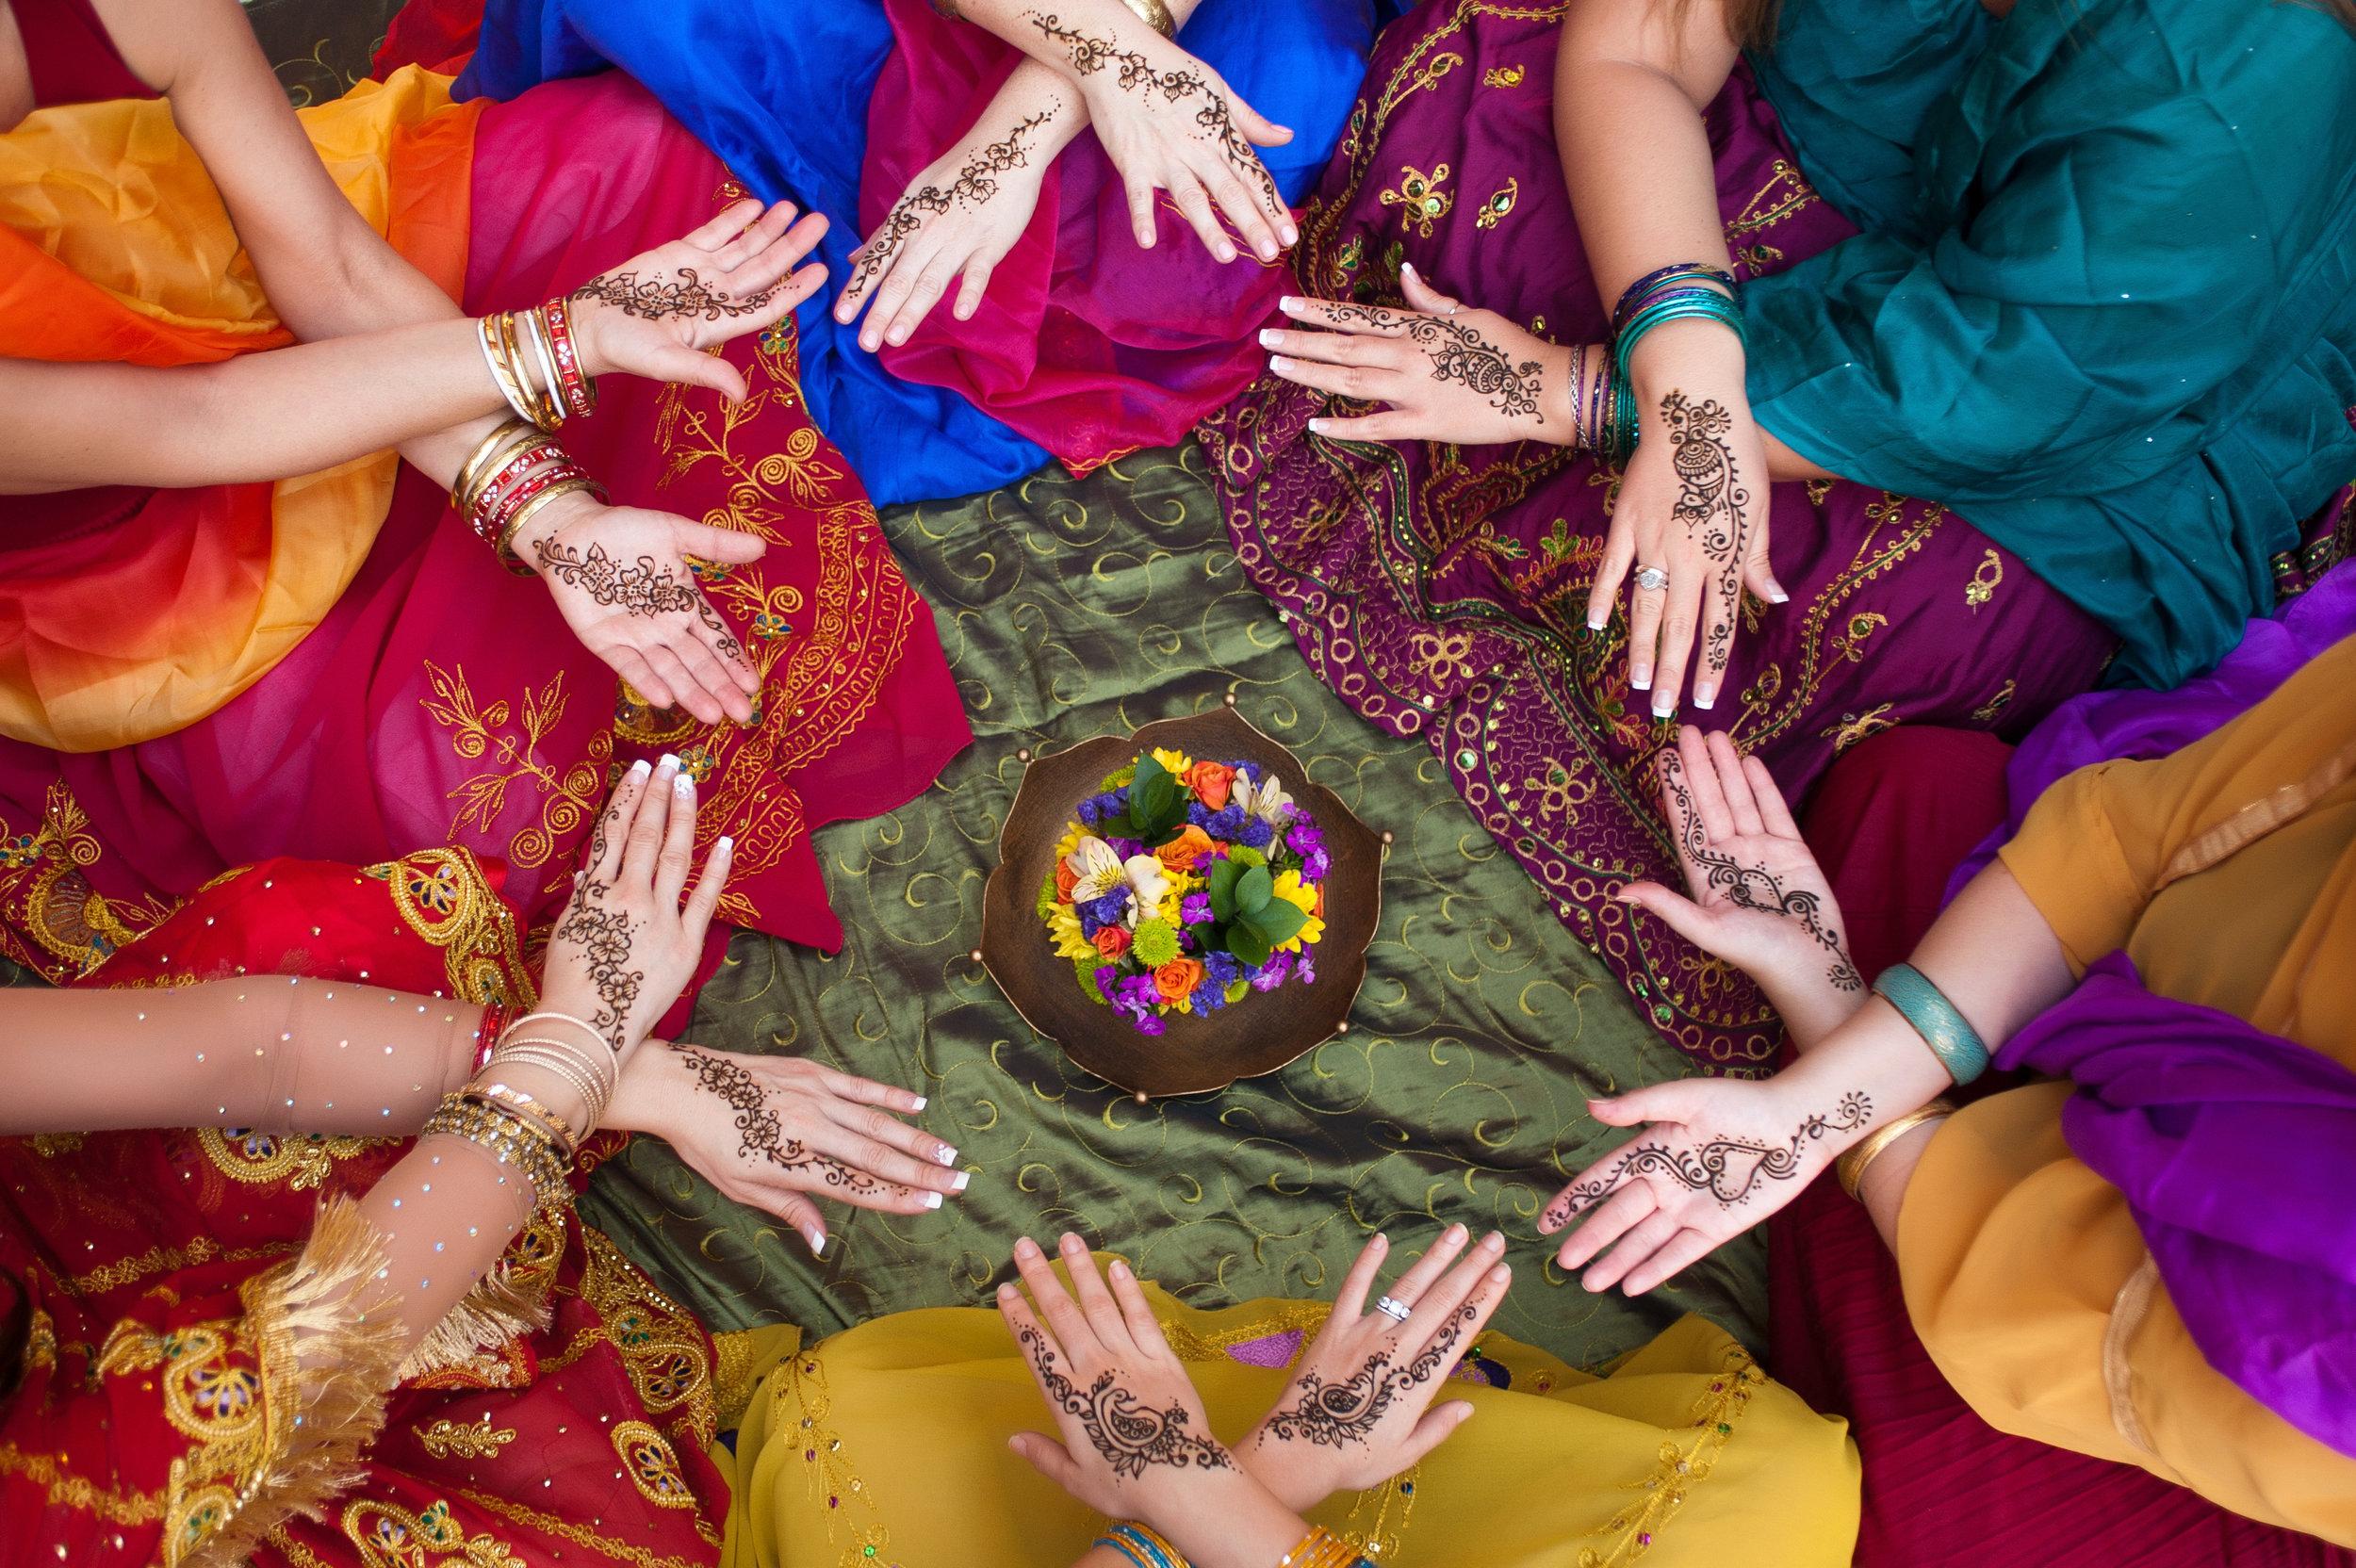 women, circle, community, henna, hands, travel develops empathy